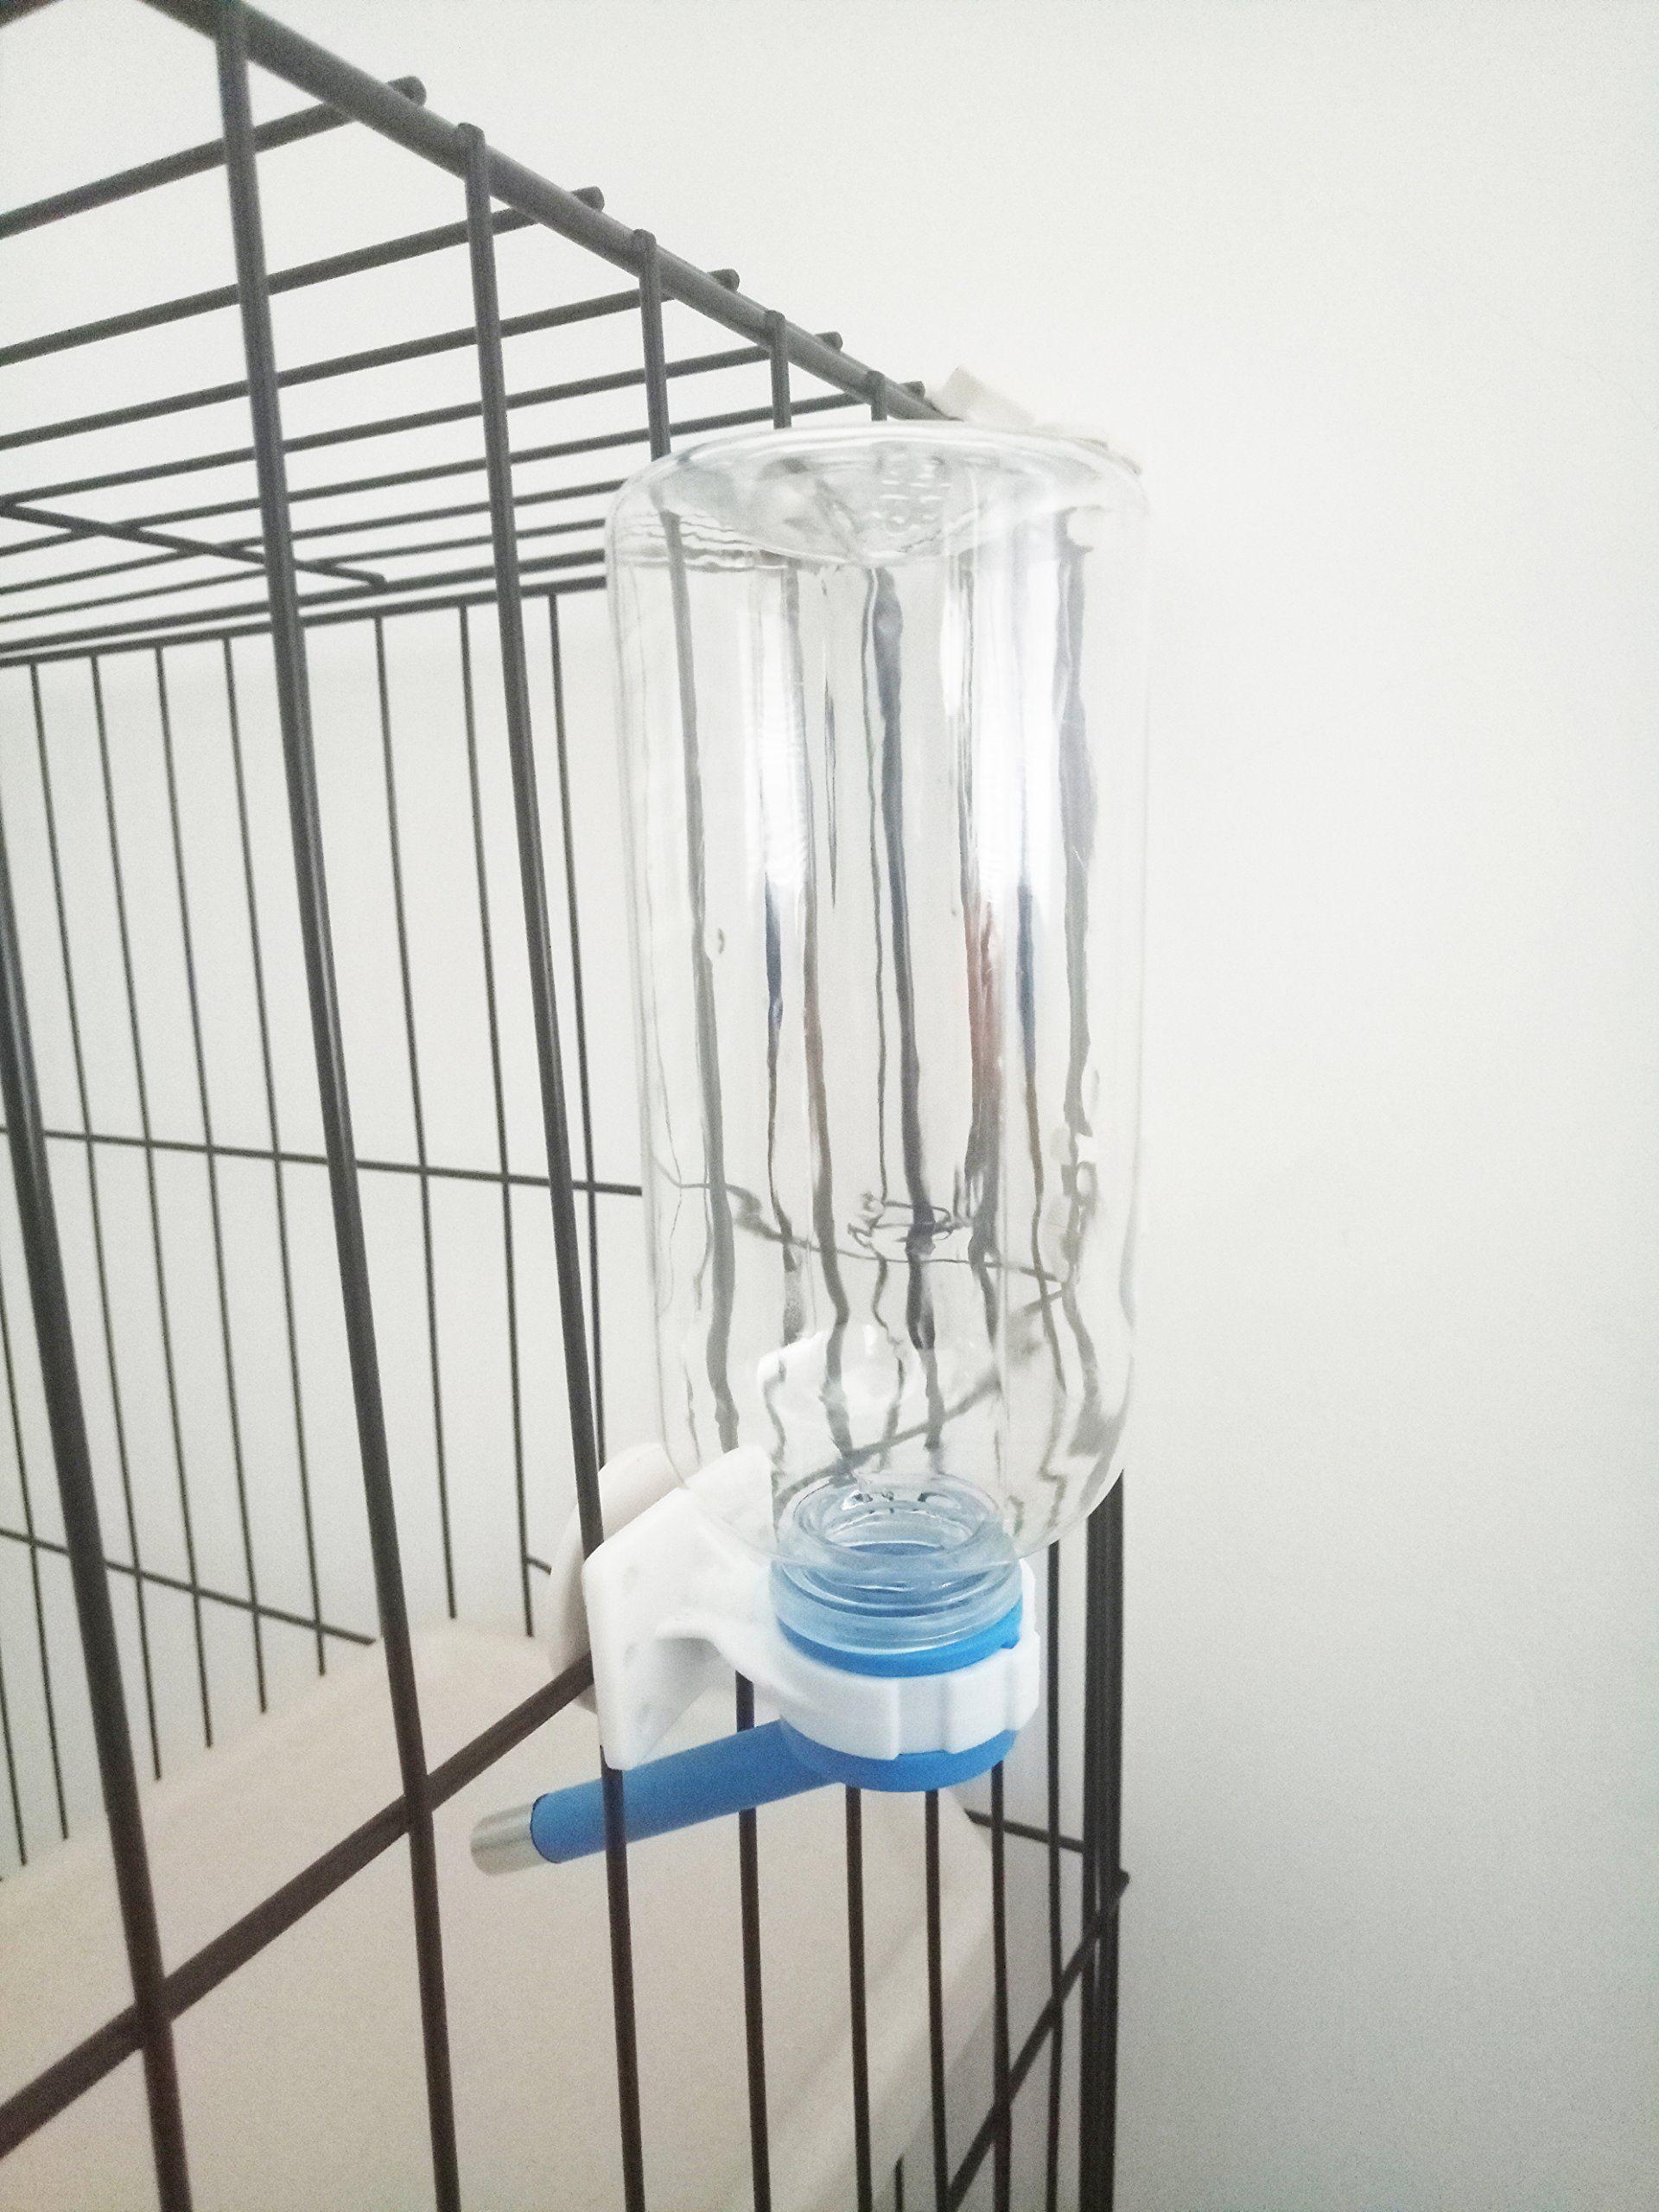 SatisPet Rabbit Automatic NonDrip Water Bottle 16 fl oz â